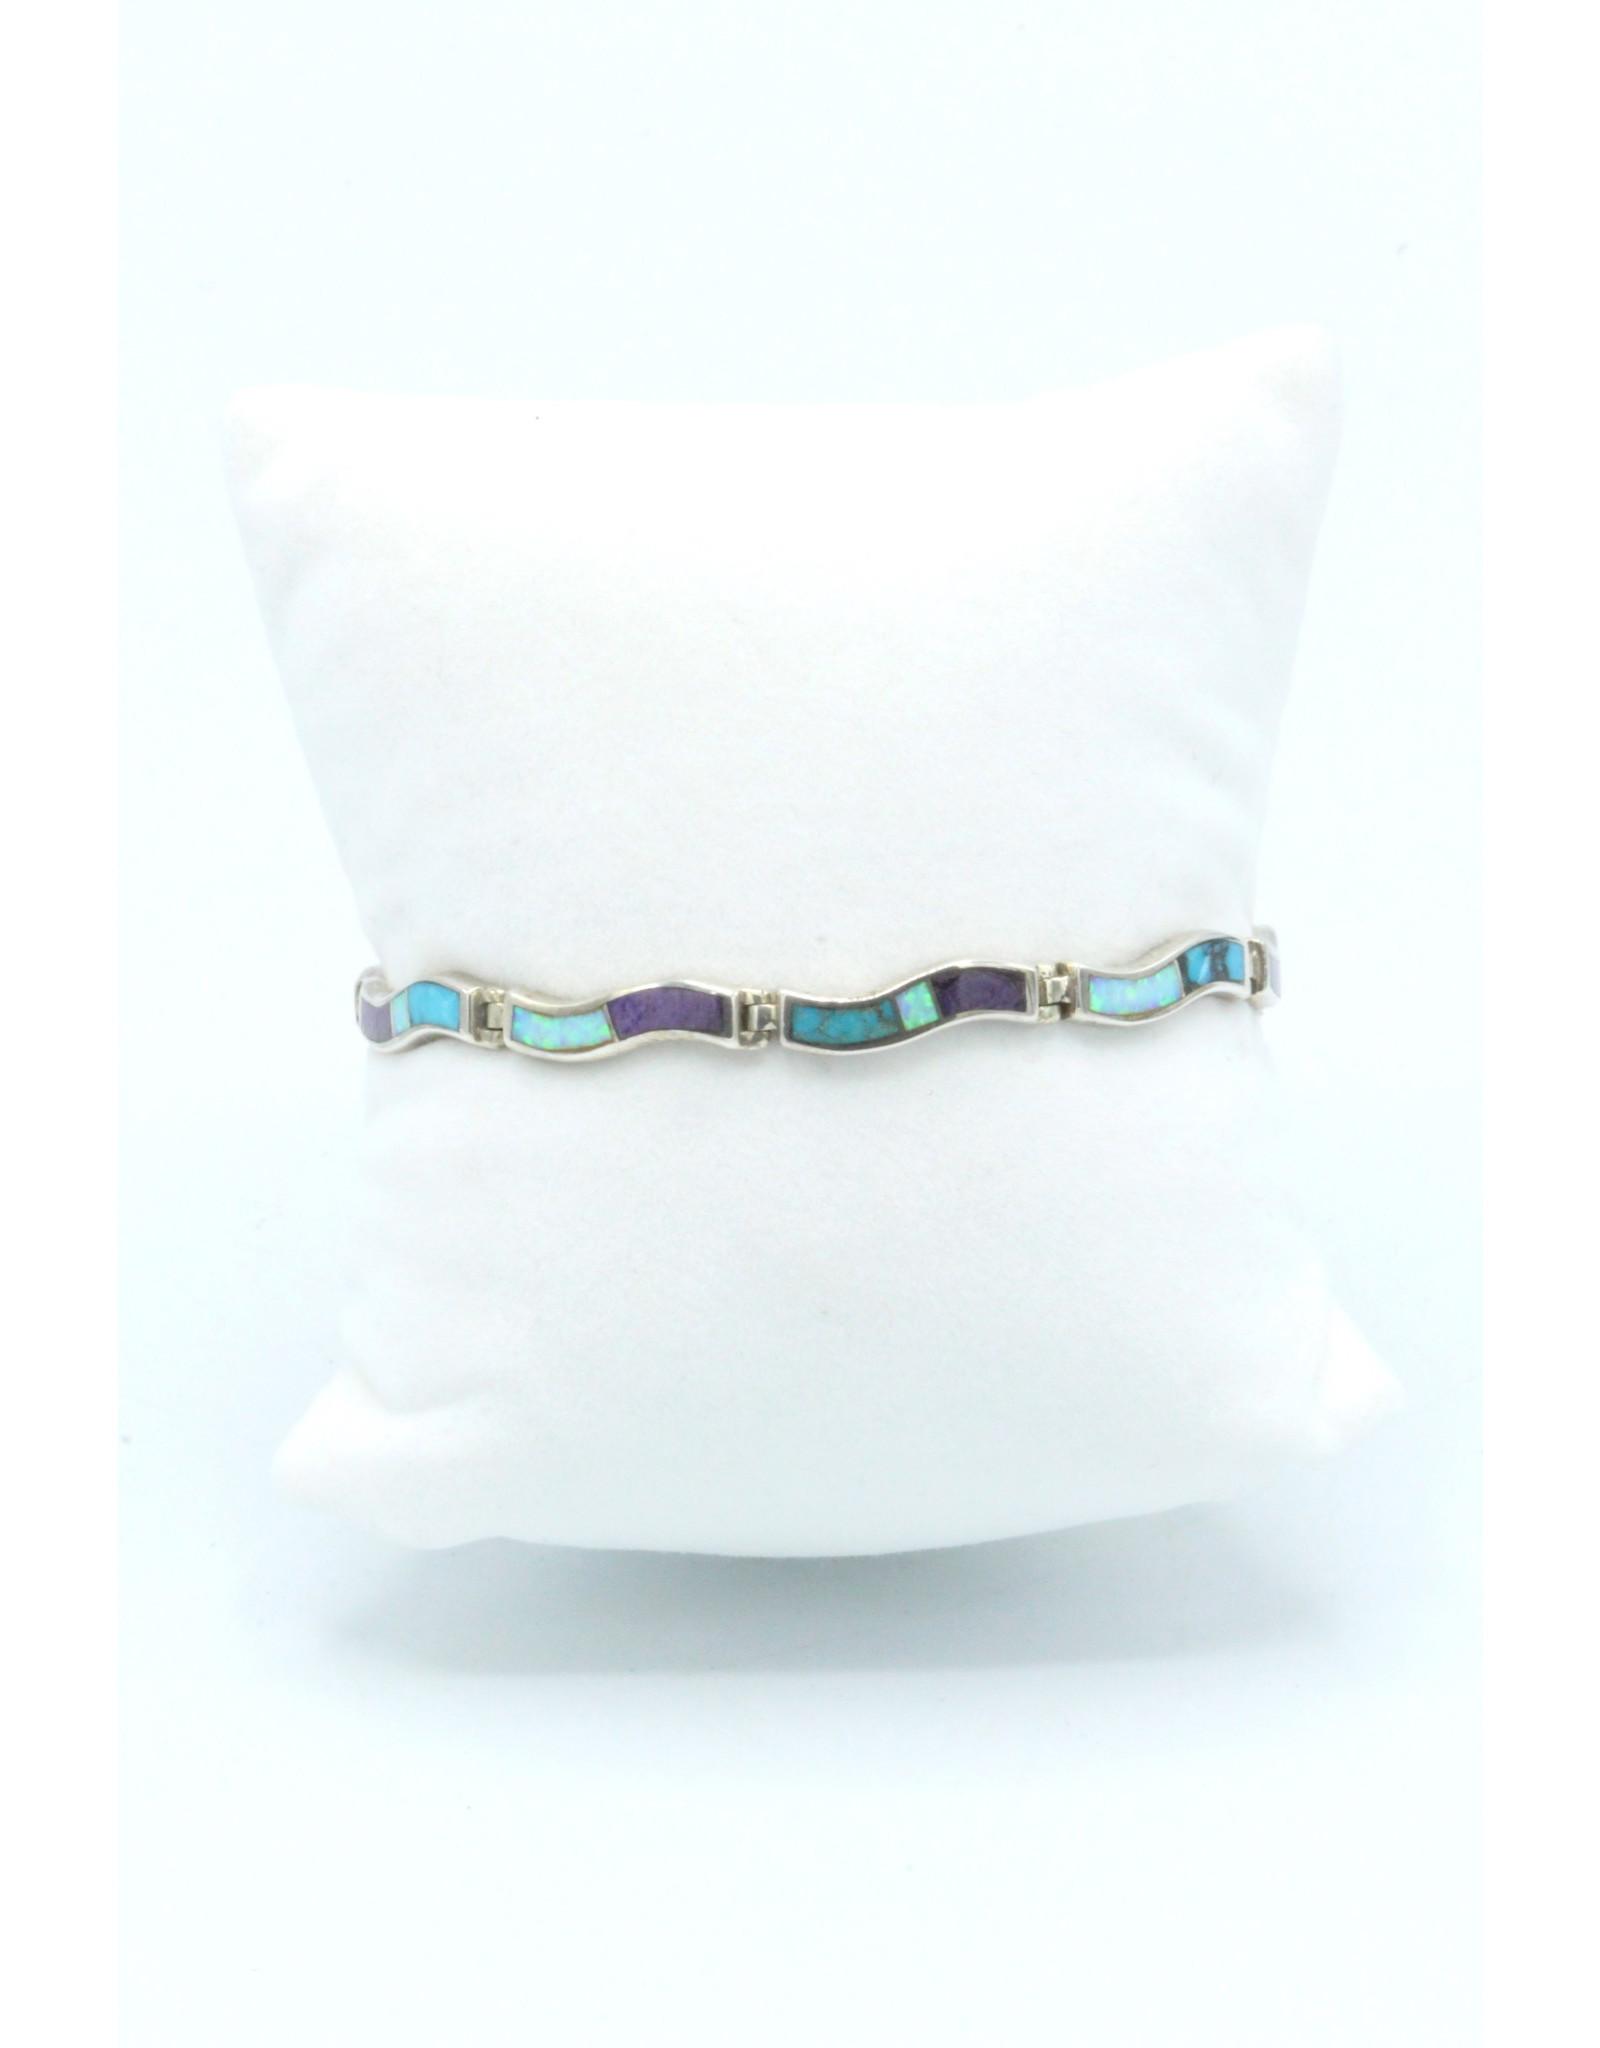 Small Bracelet - SSB102